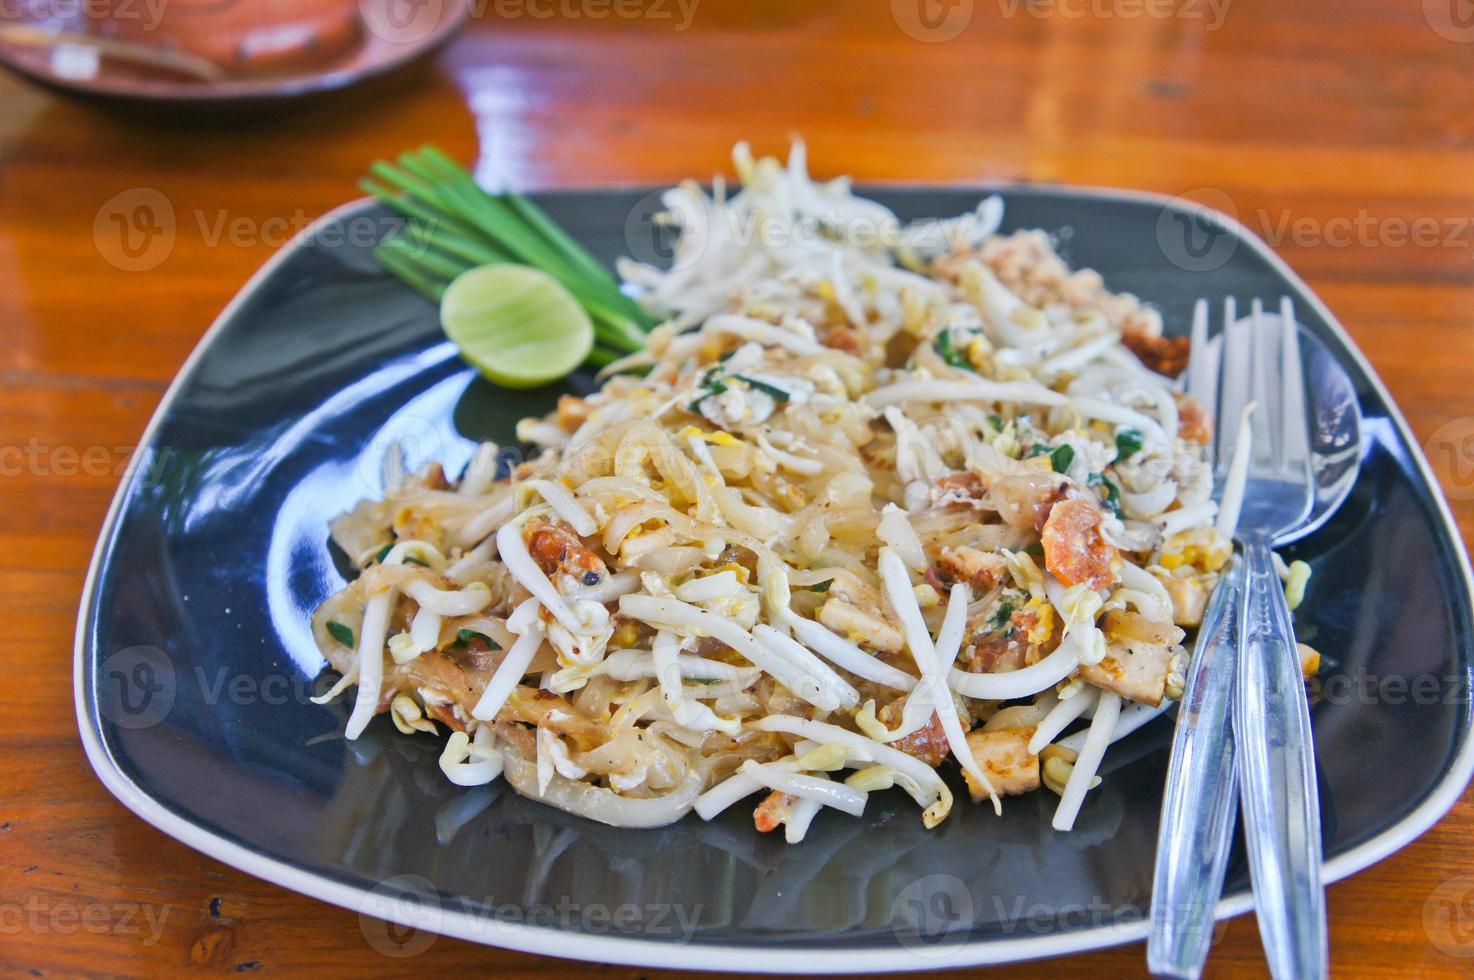 pad Thaise traditionele maaltijd in cusine van Thailand foto